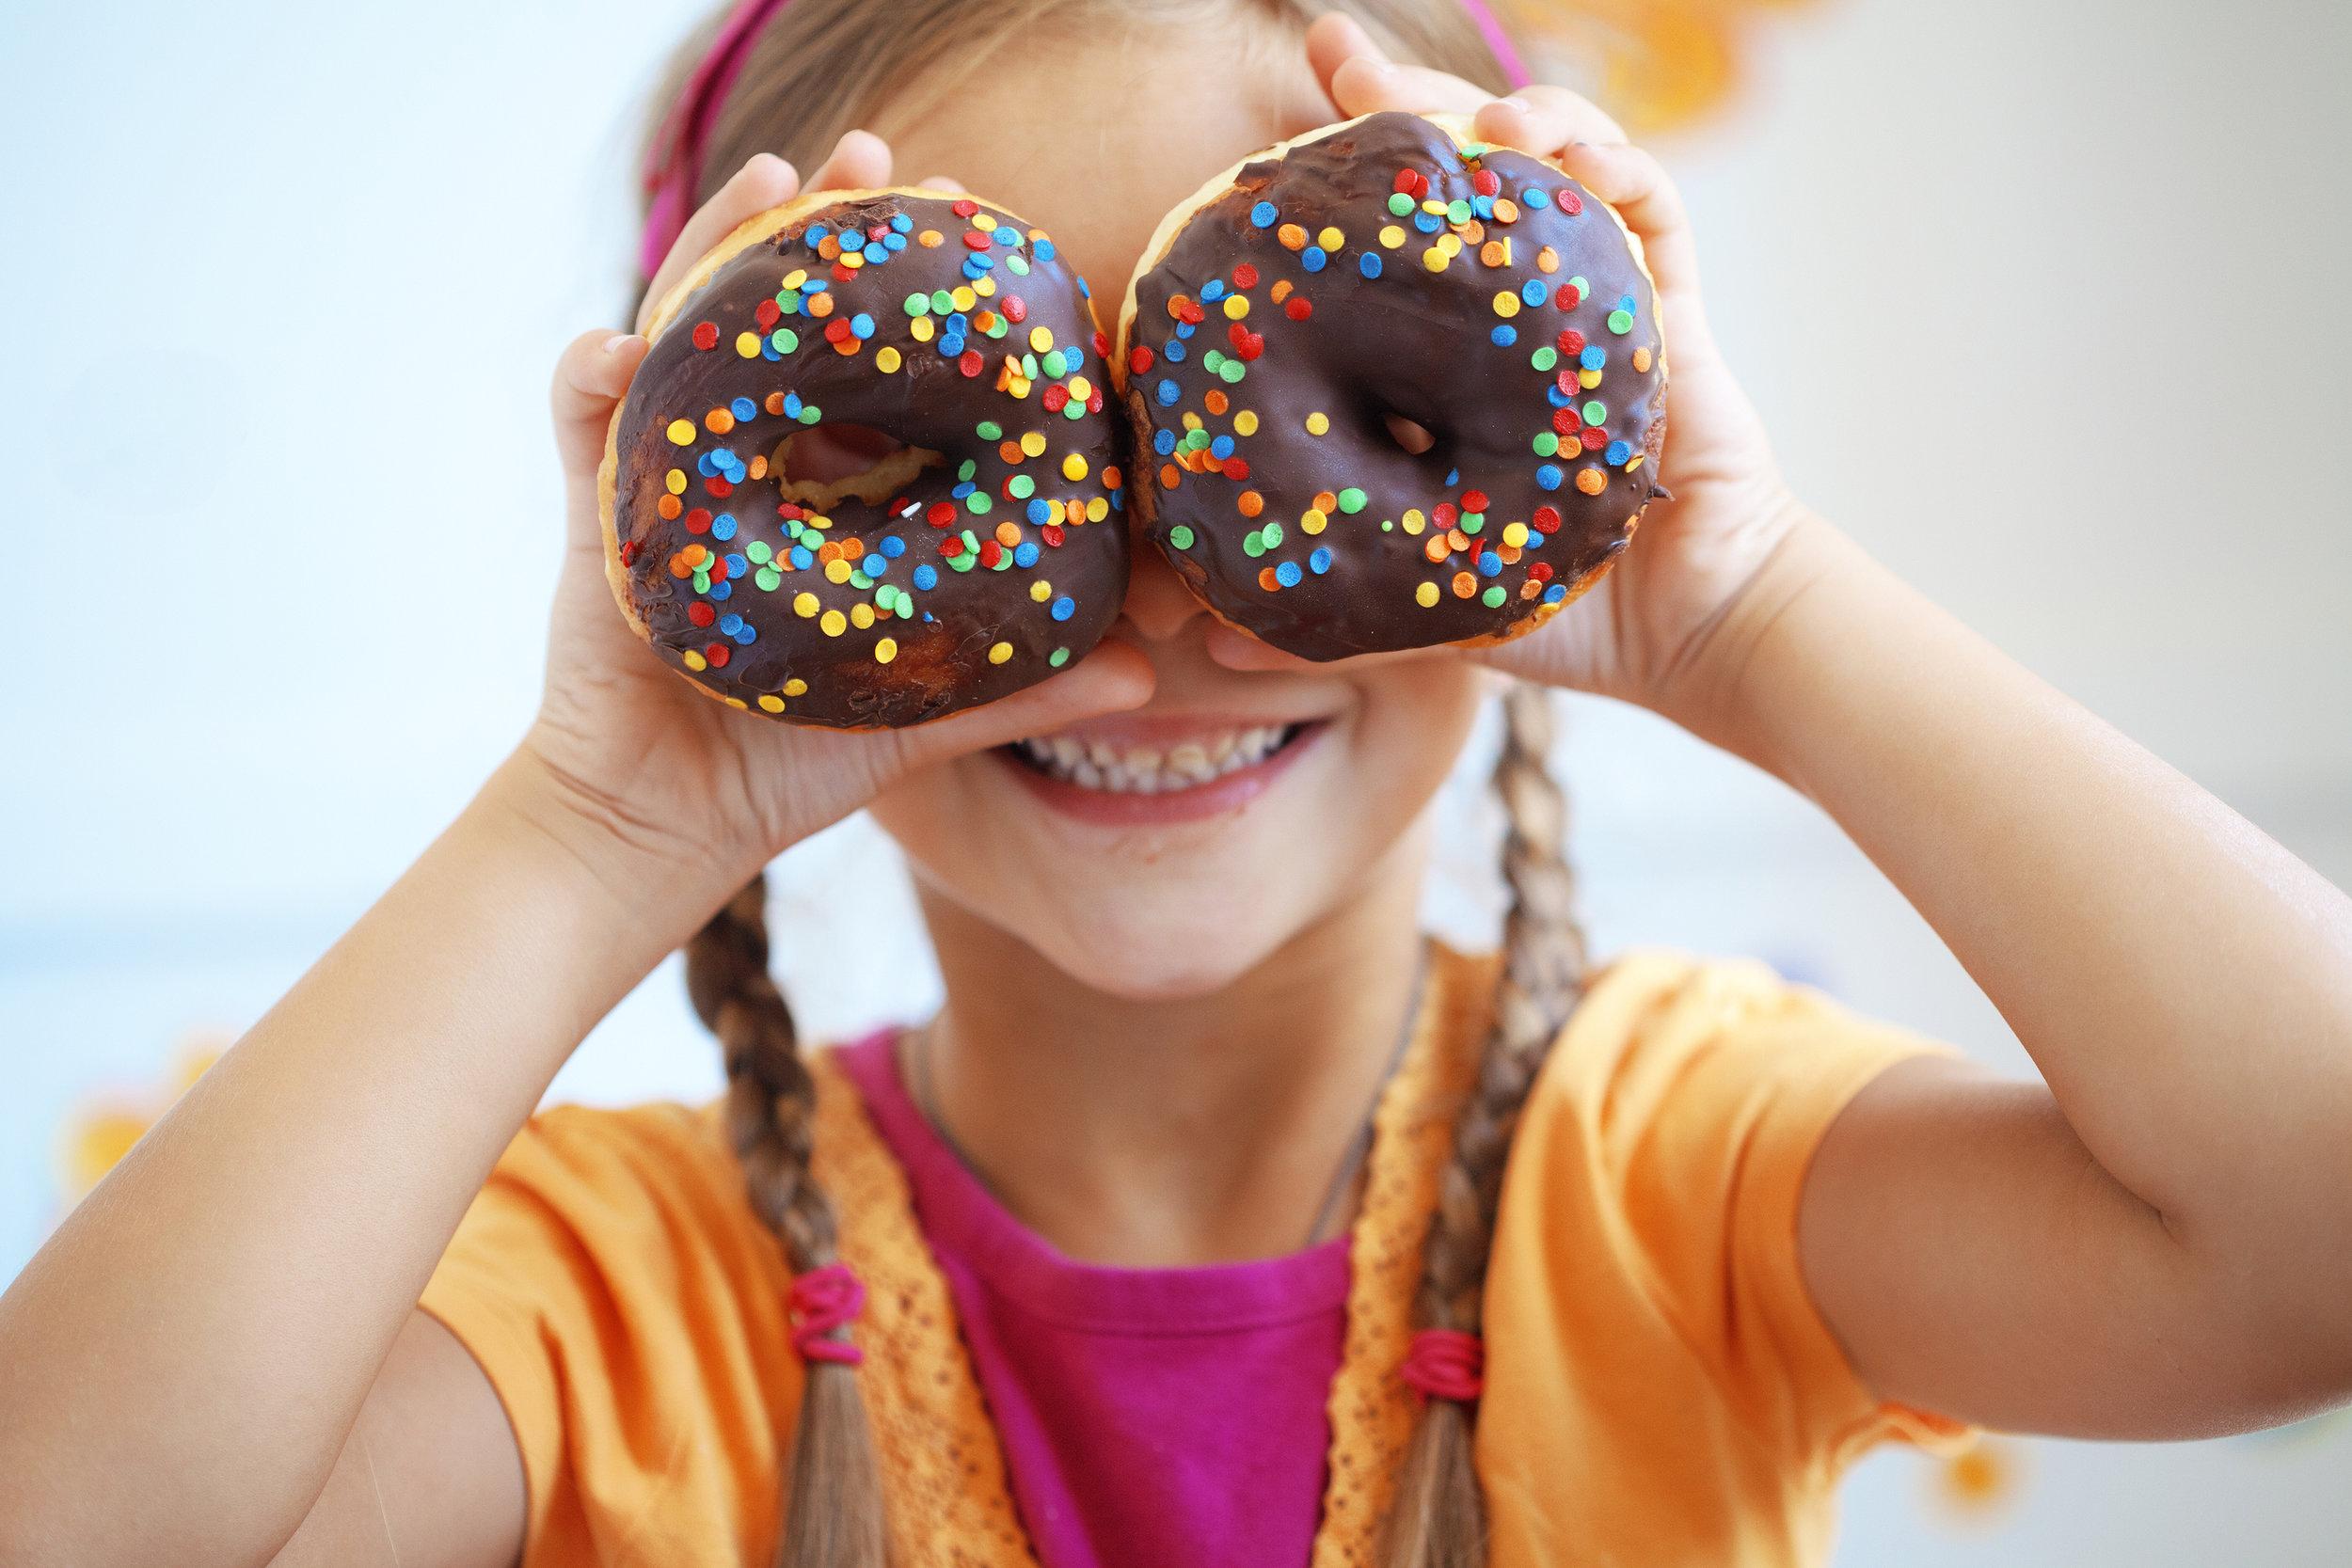 bigstock-Cute-kid-girl-eating-sweet-don-36555823.jpg